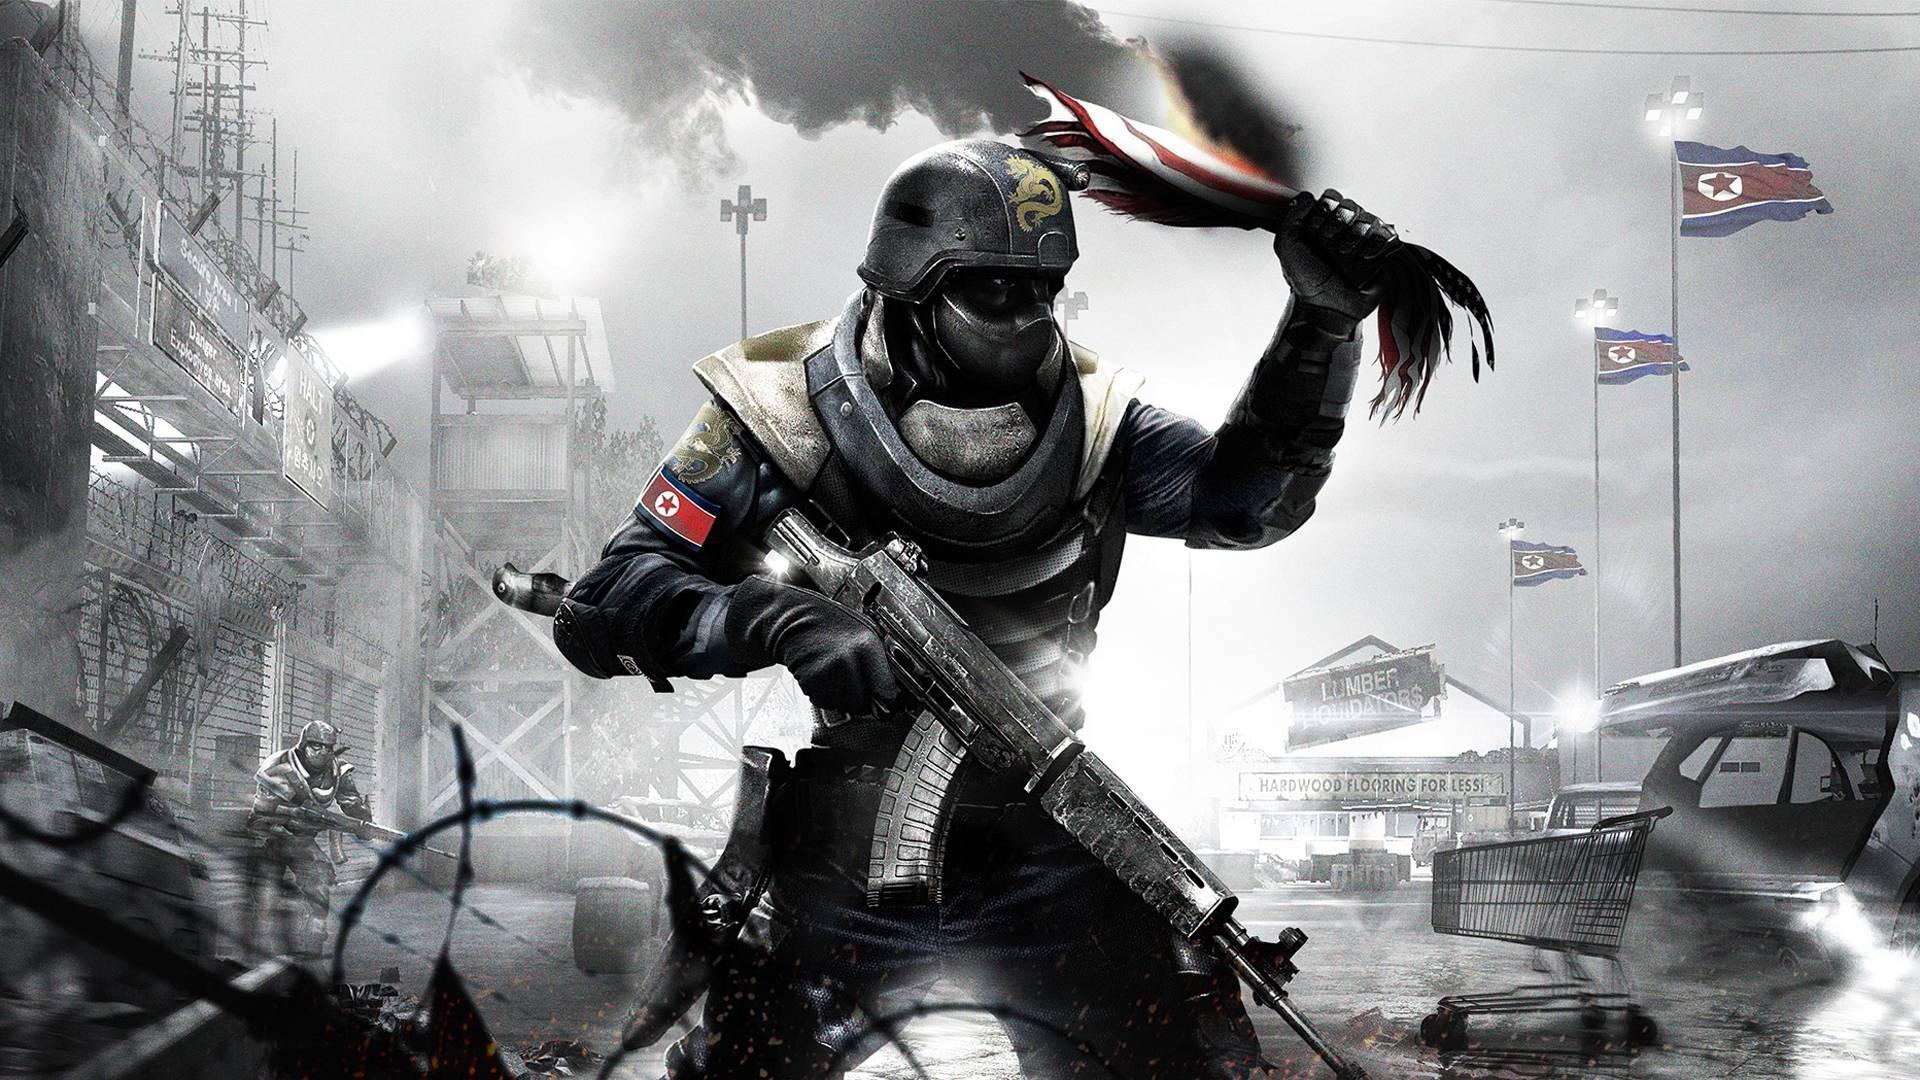 Free download HD Gaming wallpaper